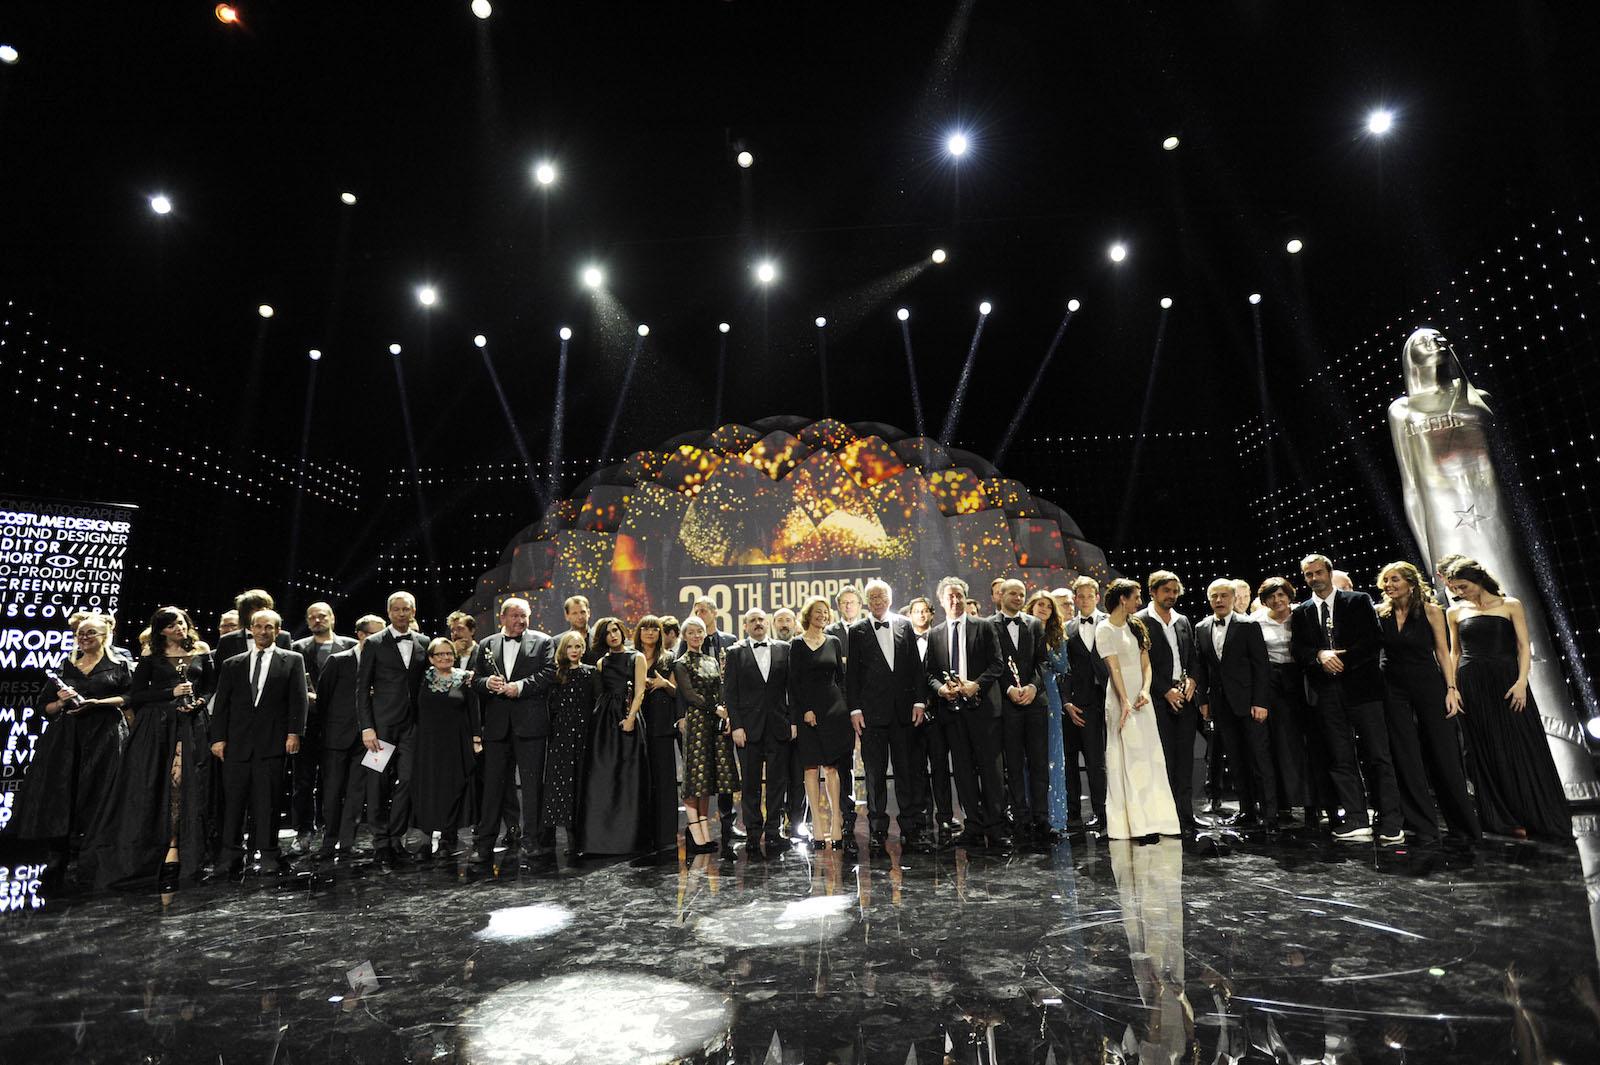 28. Europejskie Nagrody Filmowe, Agency People Image (c.) Michael Tinnefeld (źródło: materiały prasowe organizatora)